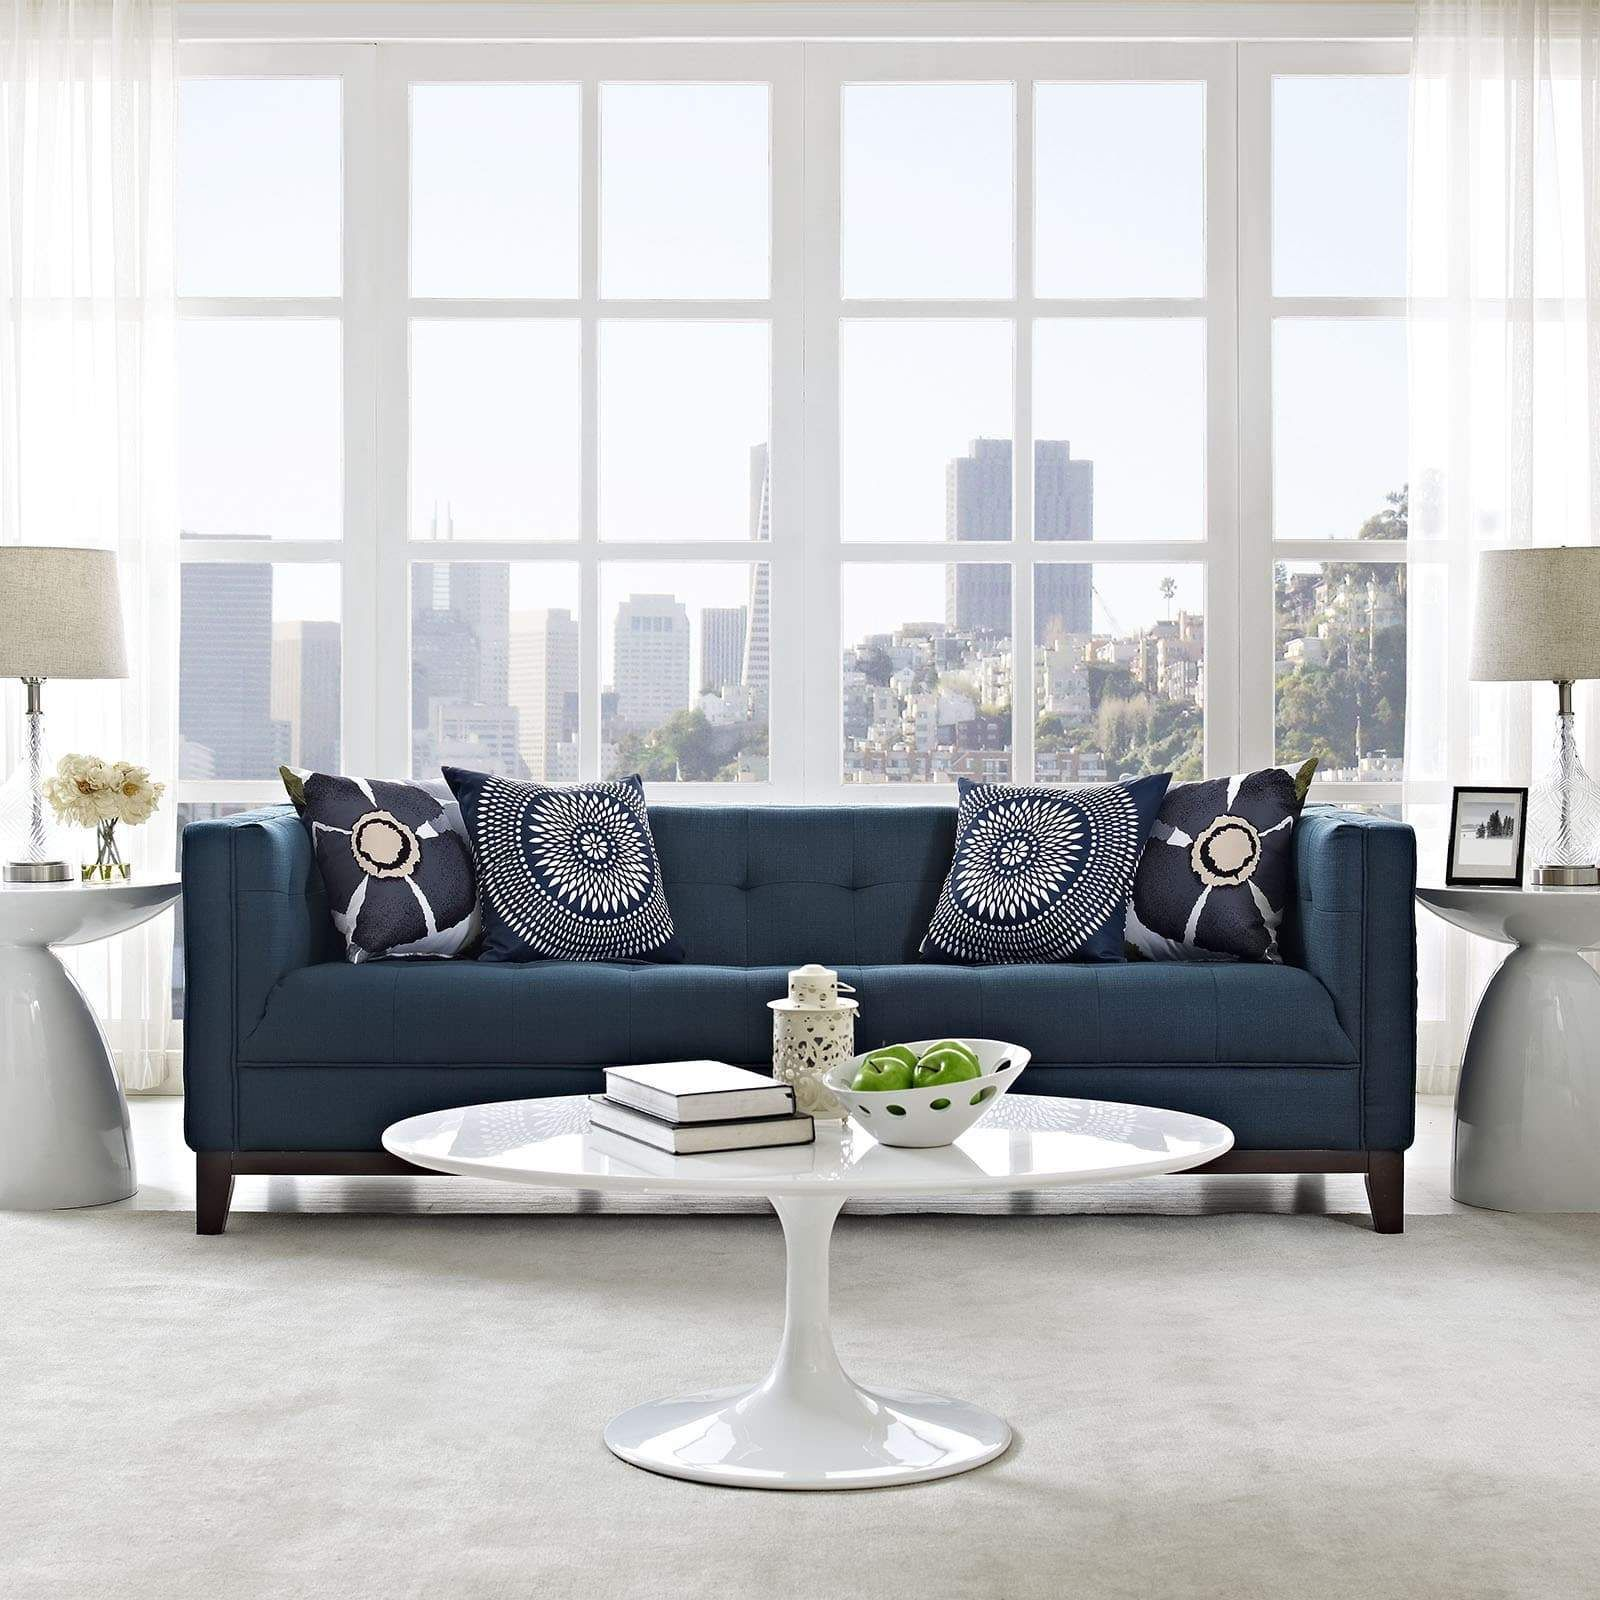 Fabric mid century modern sofa azure blue